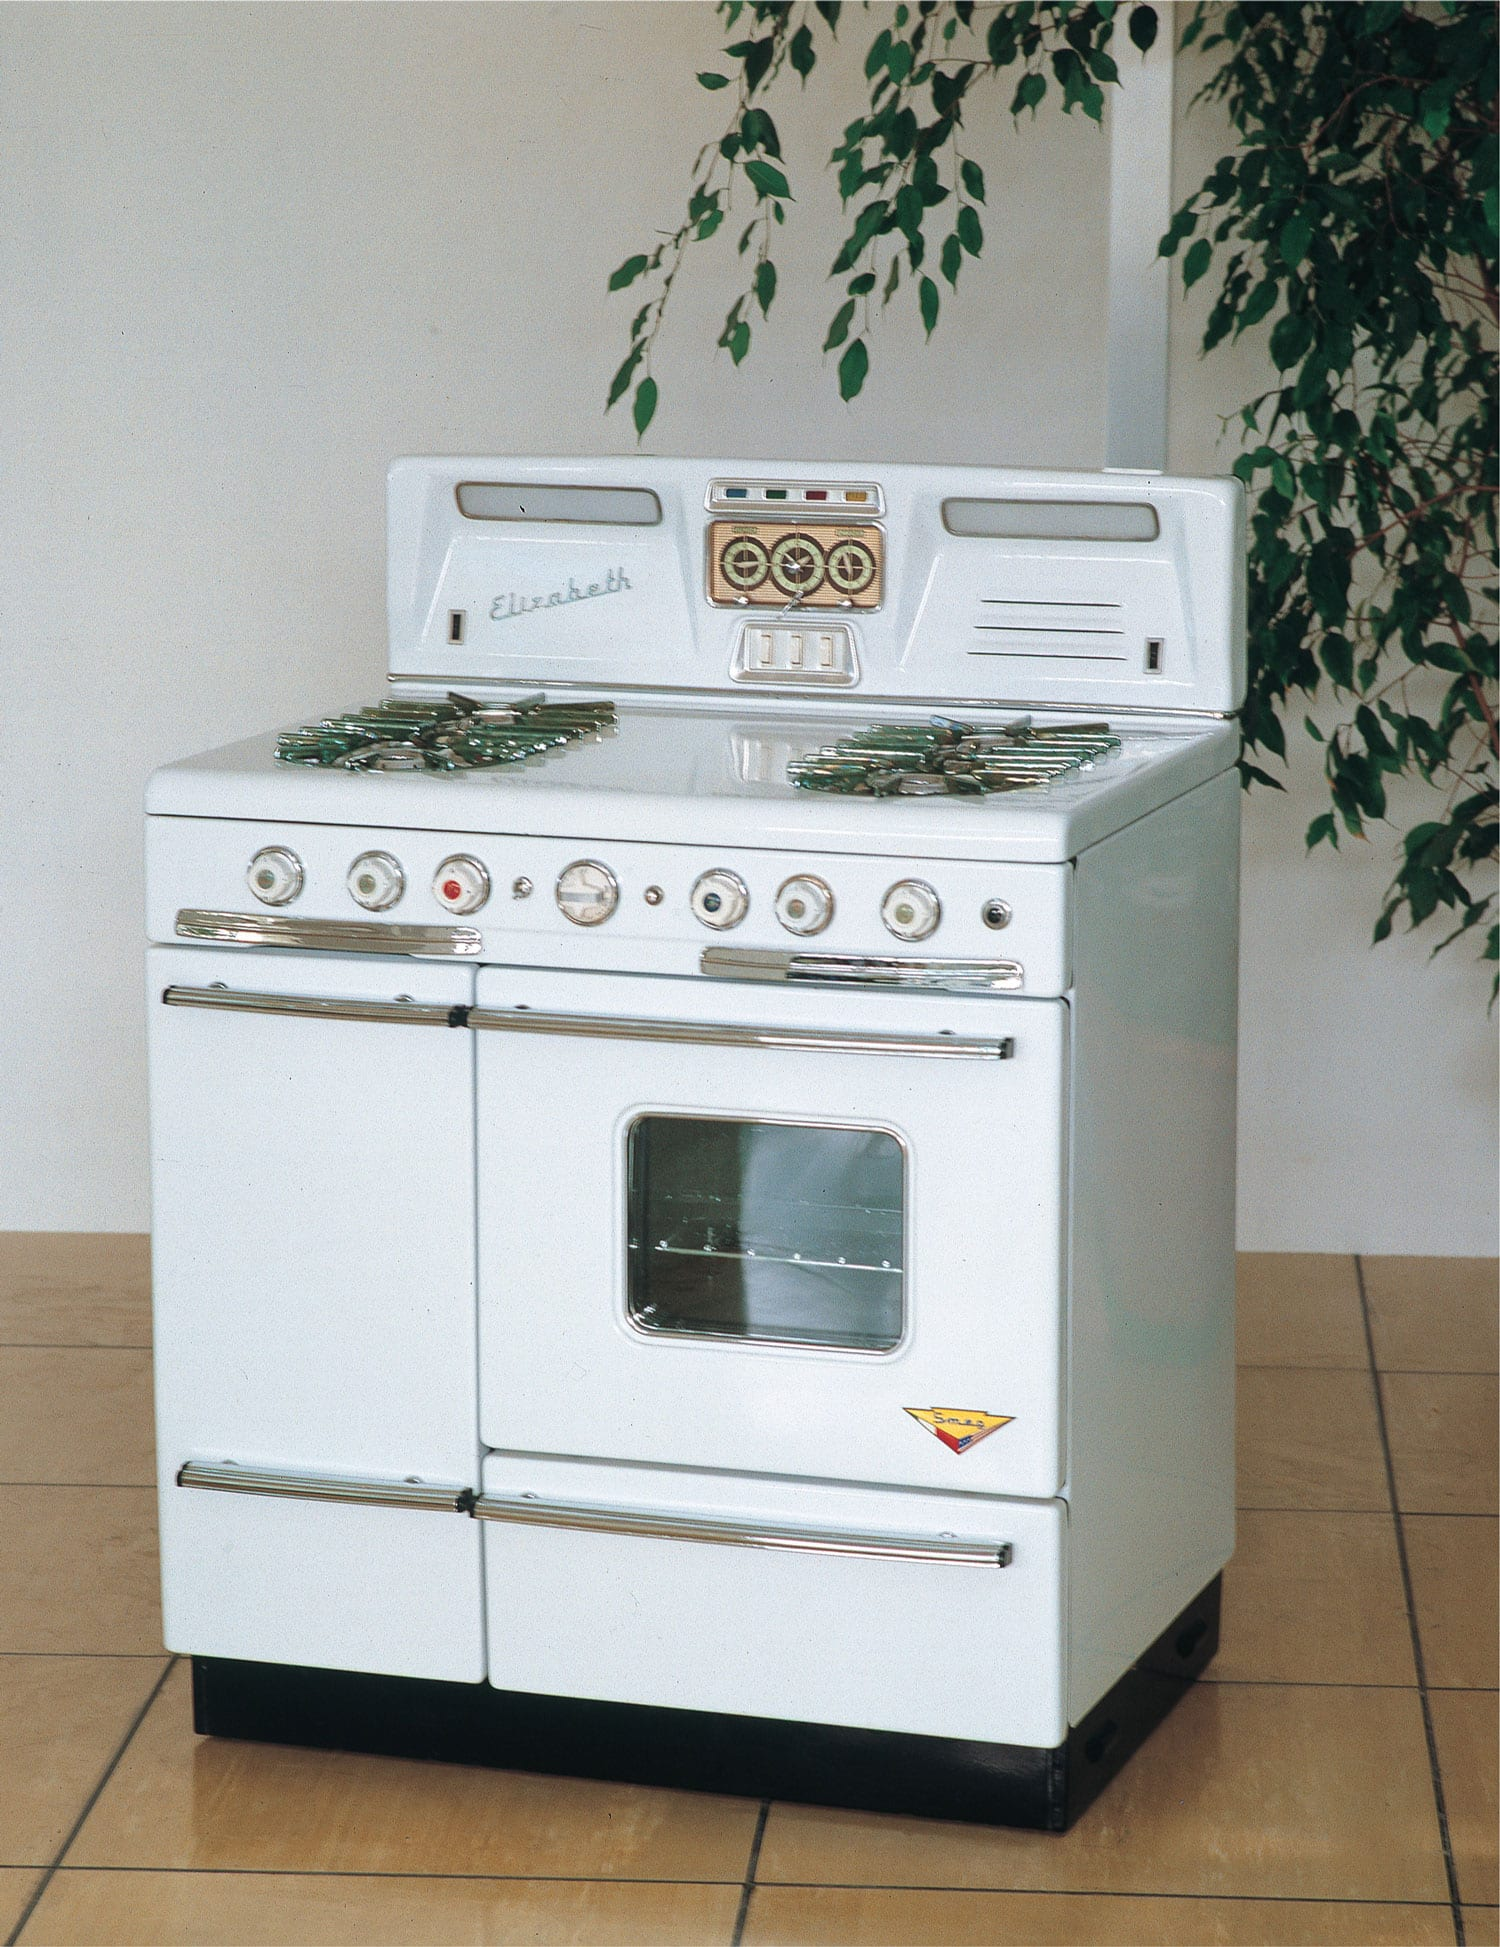 Smeg 1956 Flame Failure Cooker Elizabeth | Yellowtrace